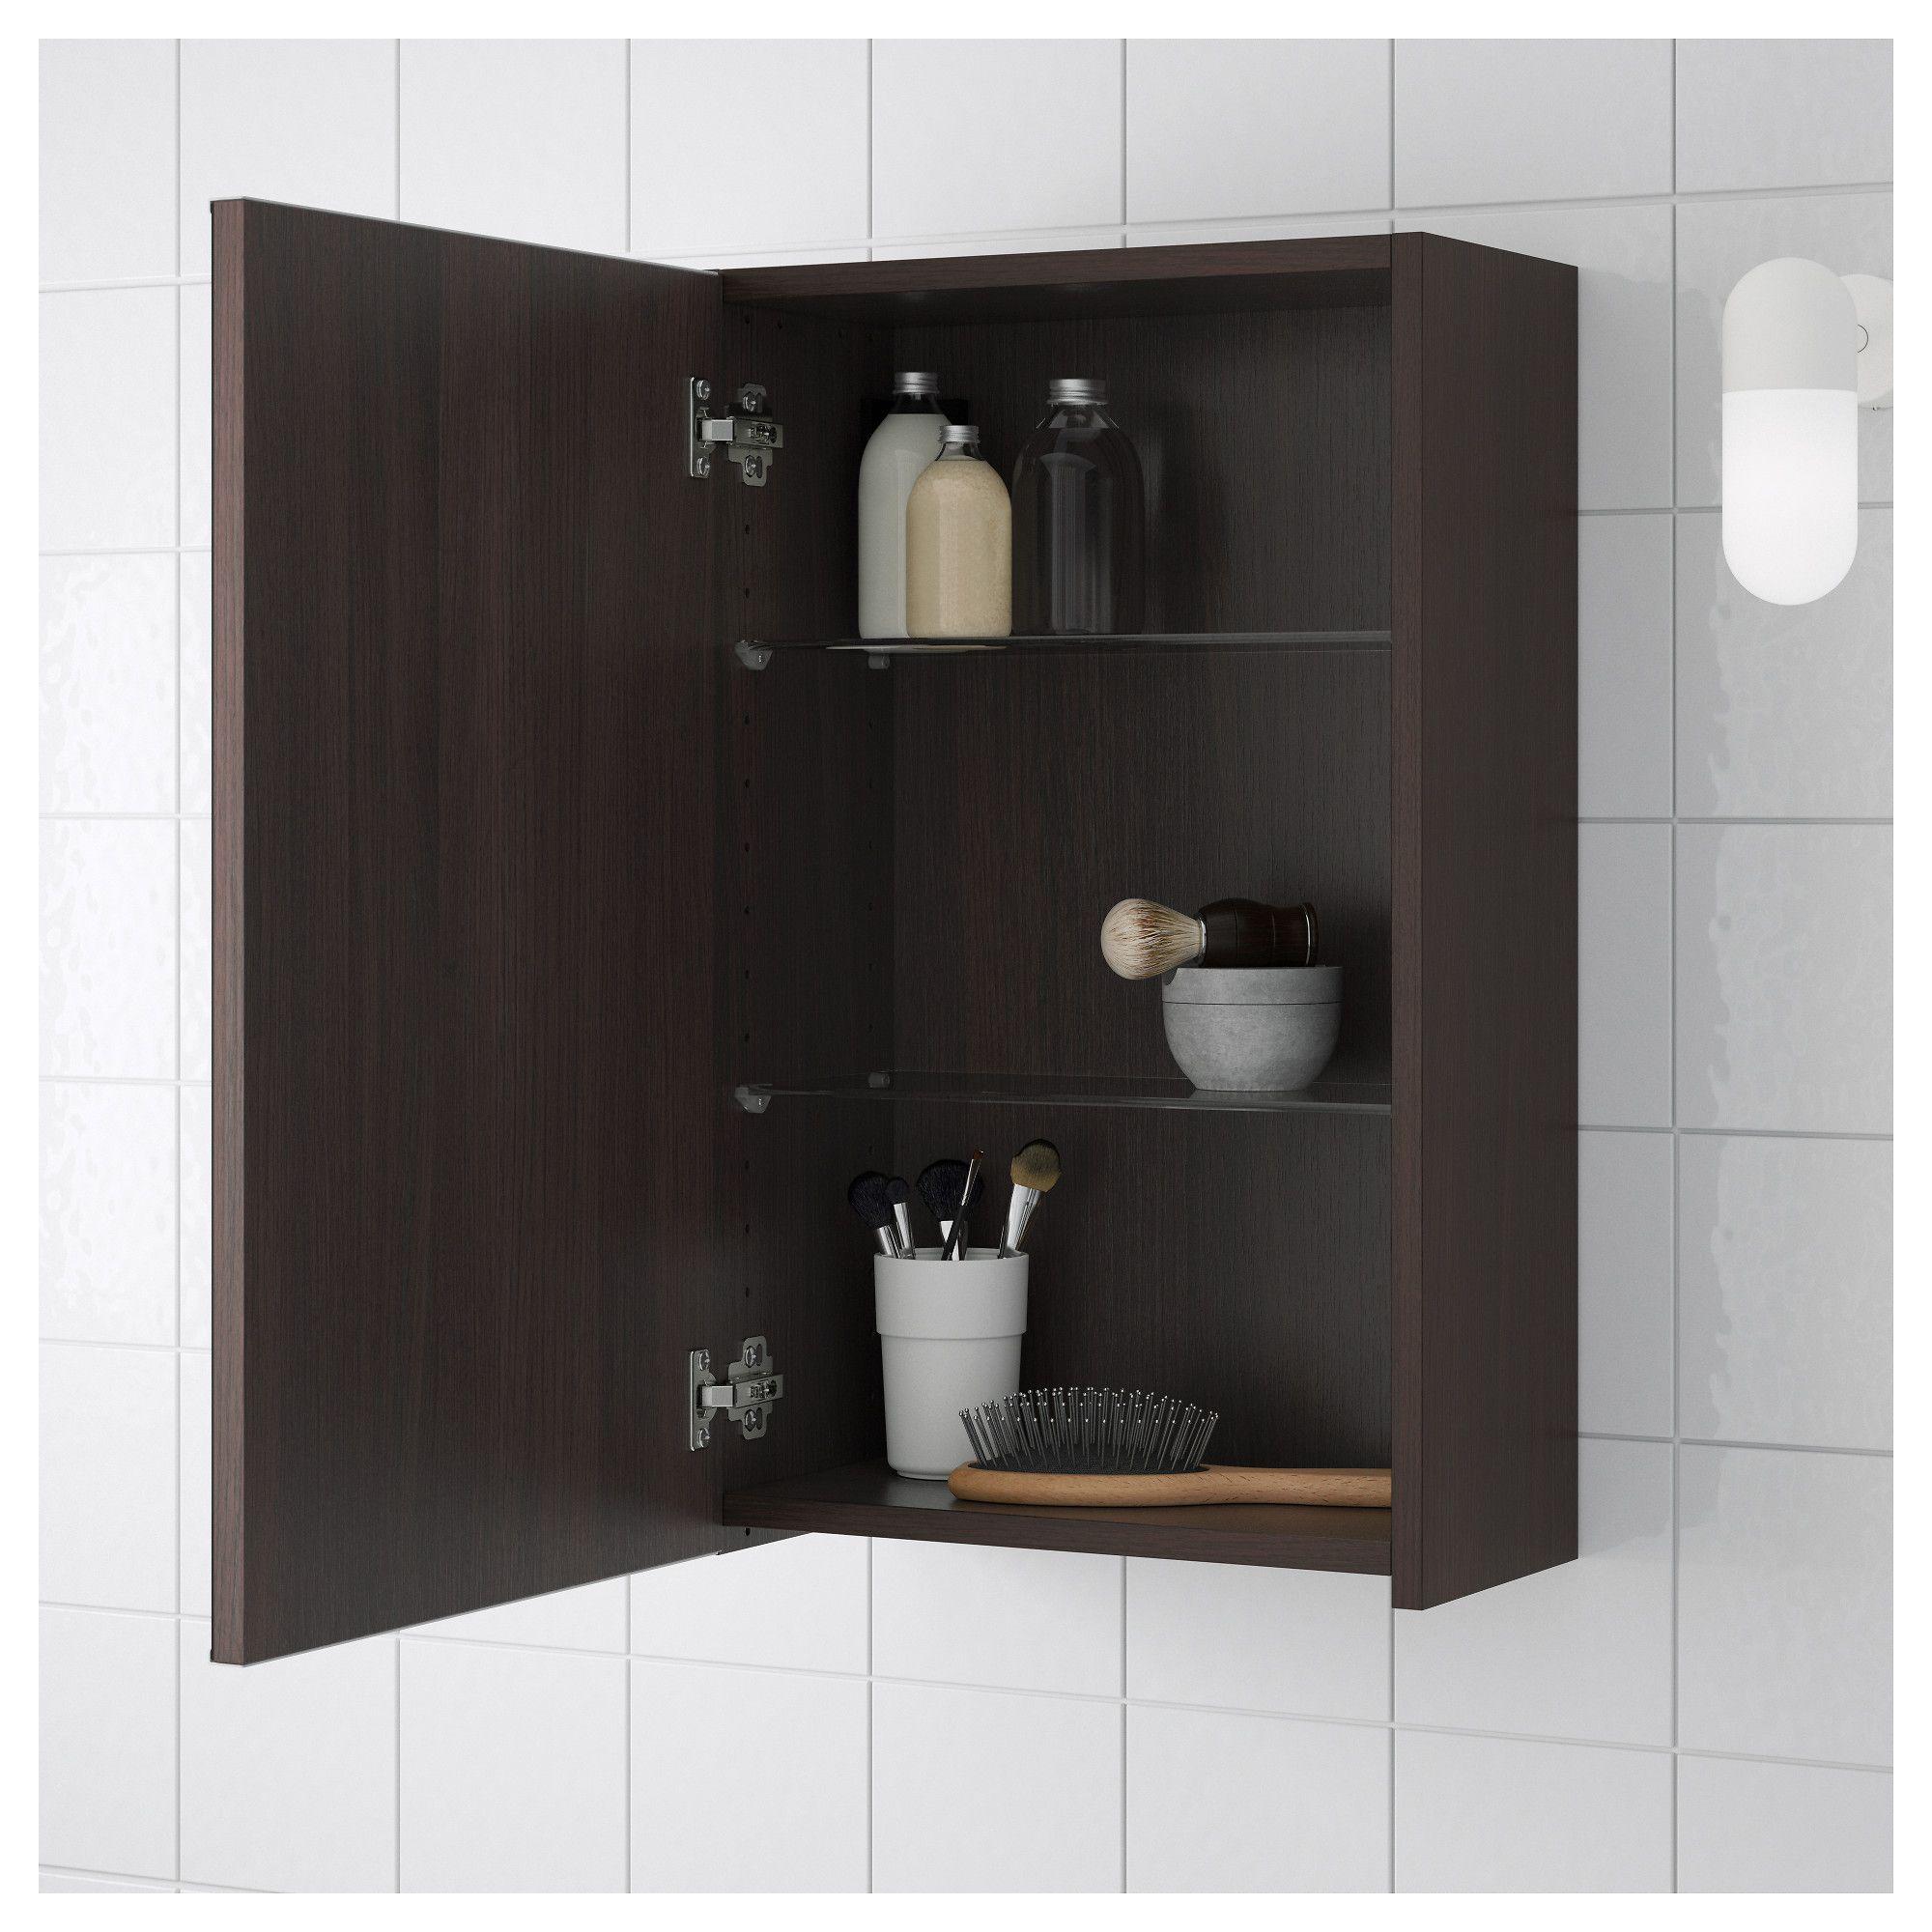 Furniture and Home Furnishings Bathroom wall